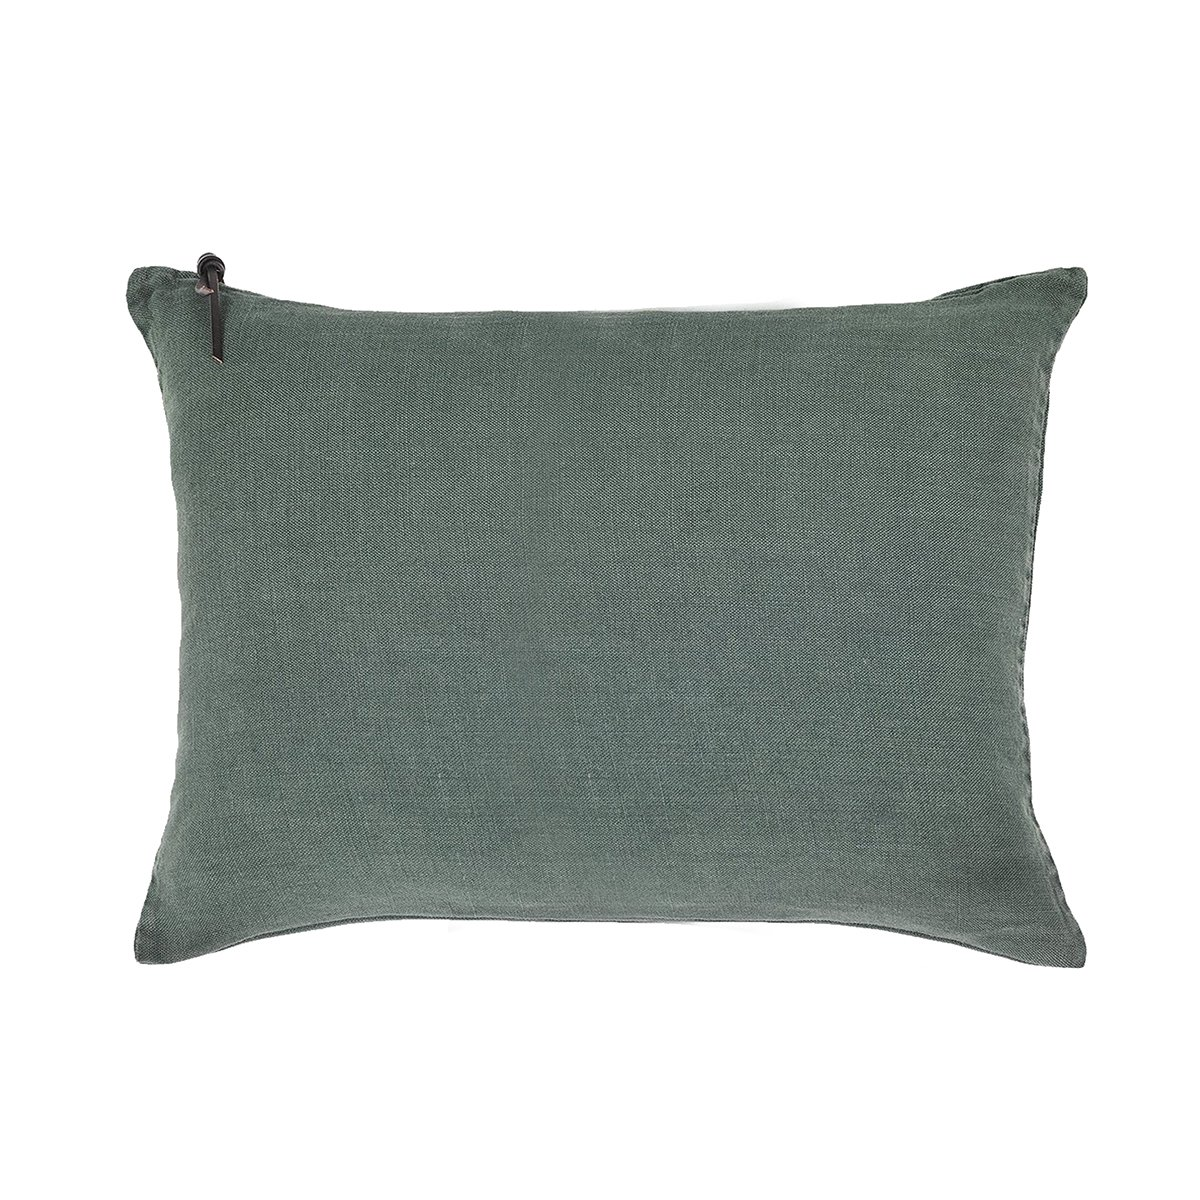 Coussin Lin pur lavé  Vert anglais 40x60